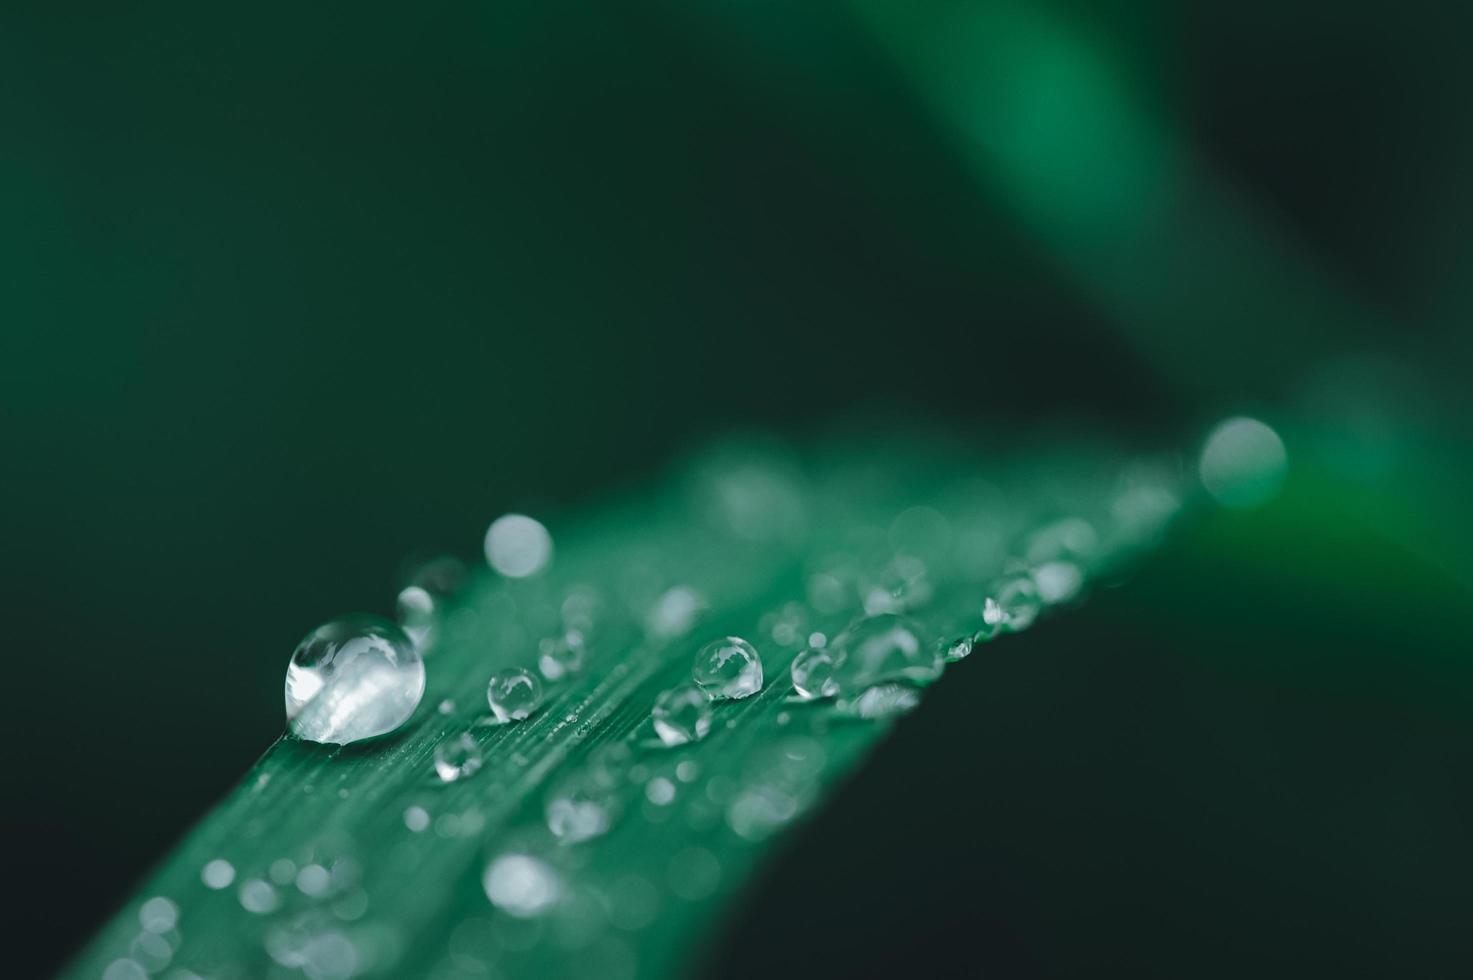 waterdruppels groen blad blad foto